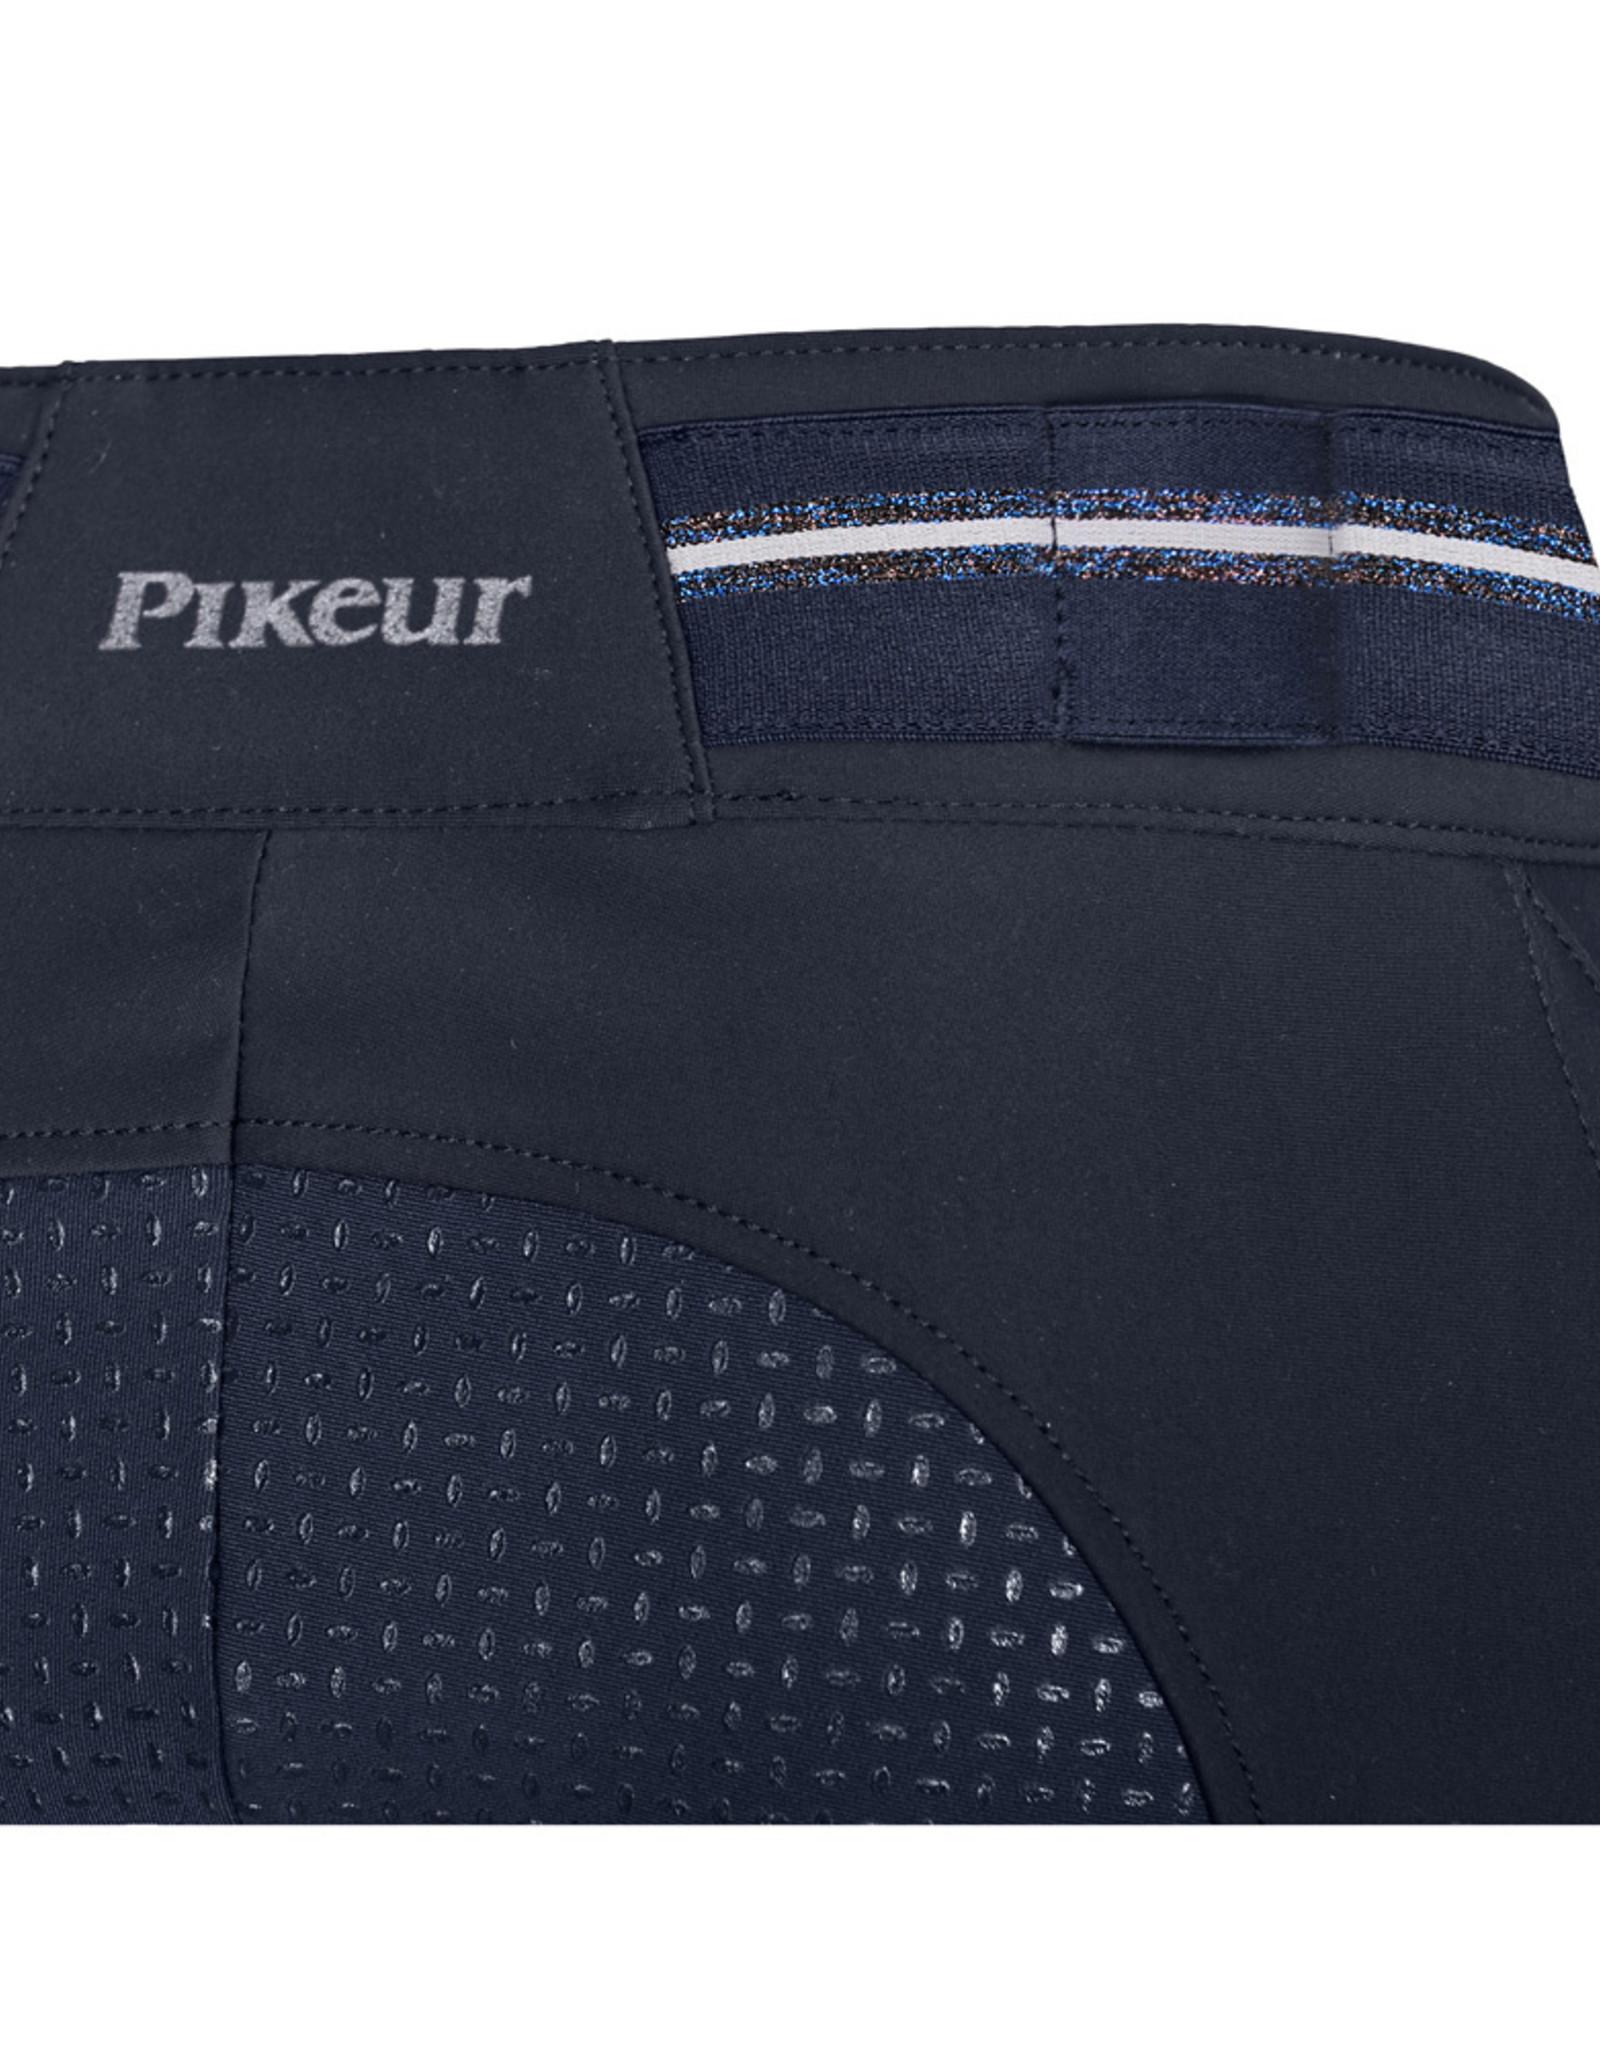 Pikeur Pikeur Calanja Grip Ladies' Full Seat Breeches